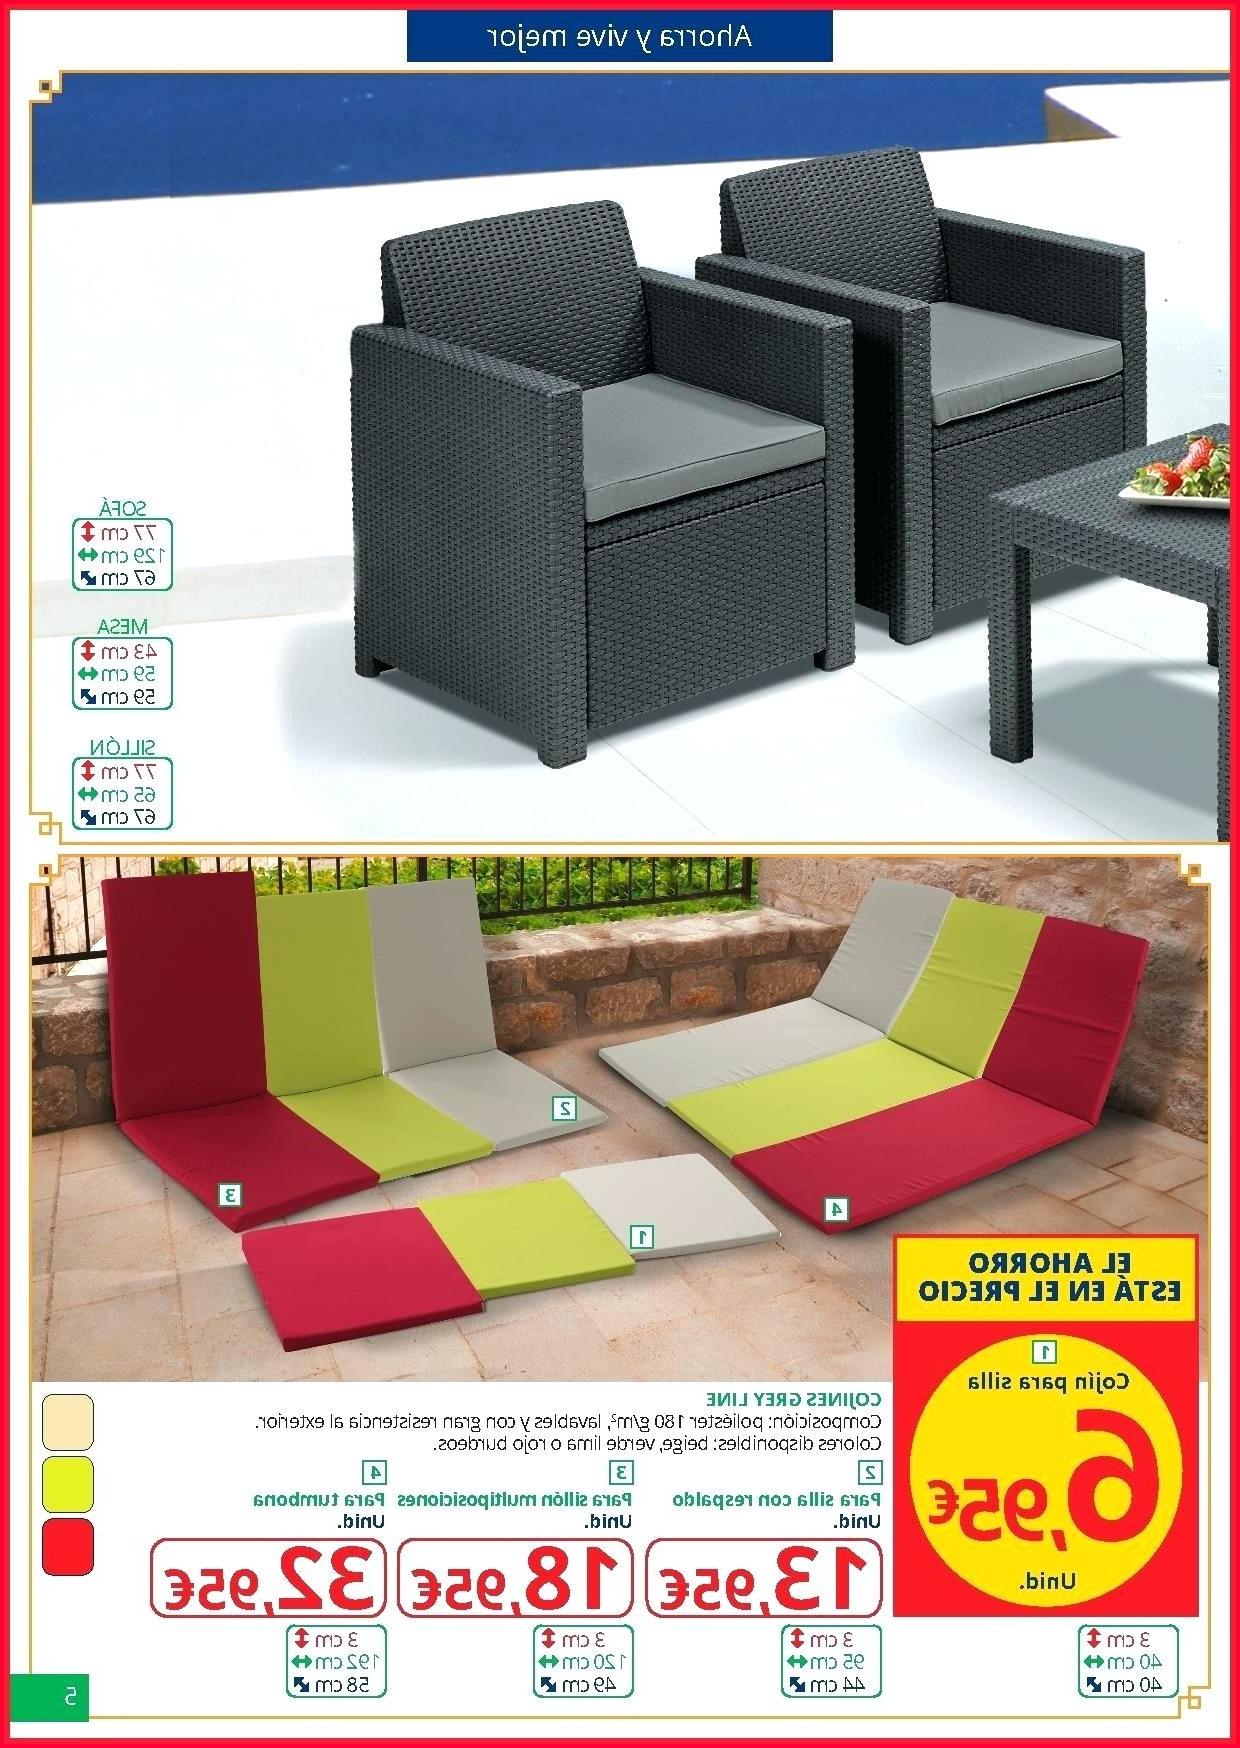 Fundas Muebles Jardin Carrefour E9dx Fundas Para Muebles De Jardin Carrefour Muebles De Terraza Y